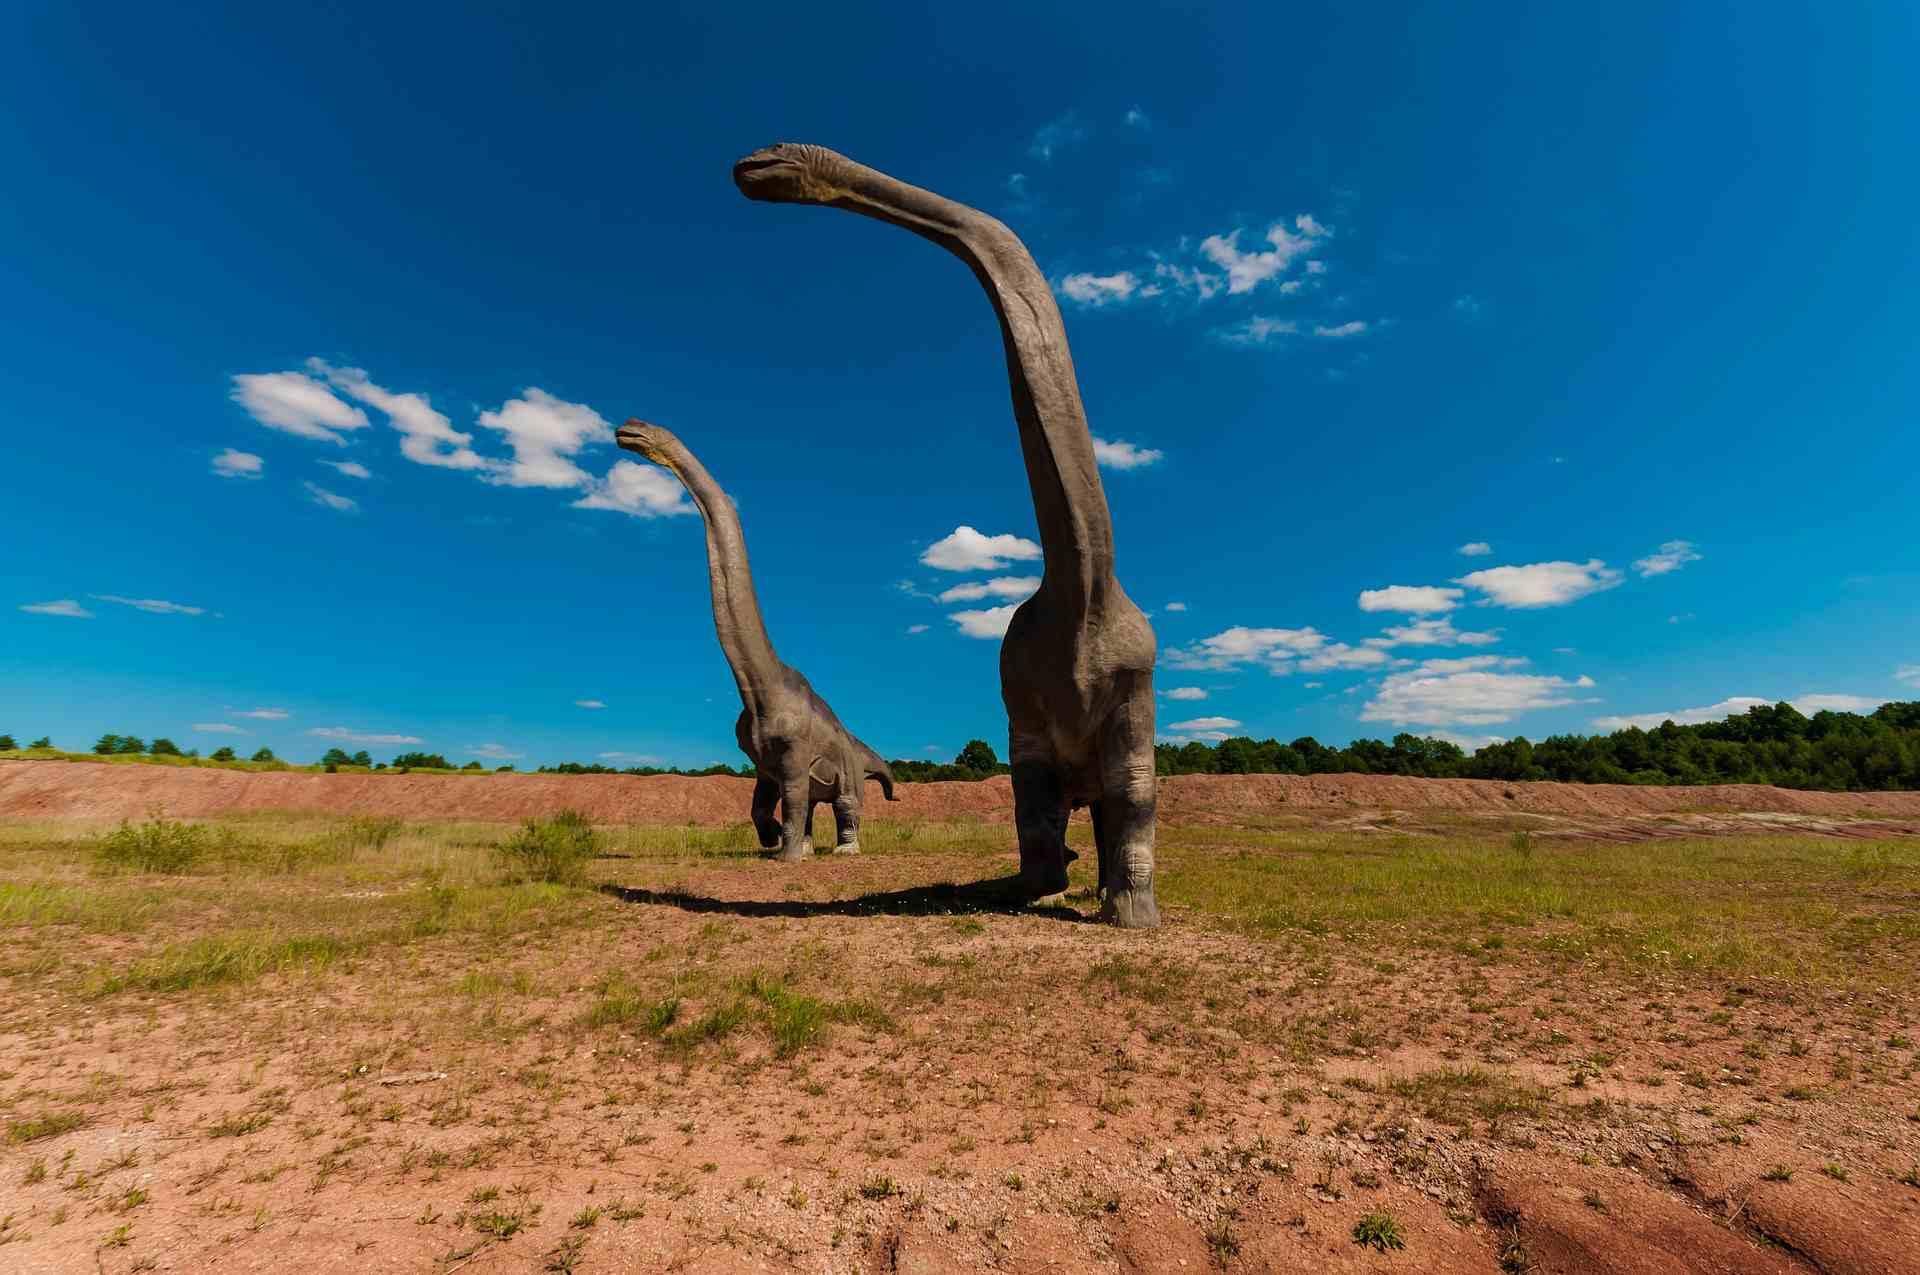 Artist rendering of long-necked dinosaurs walking across the plains.